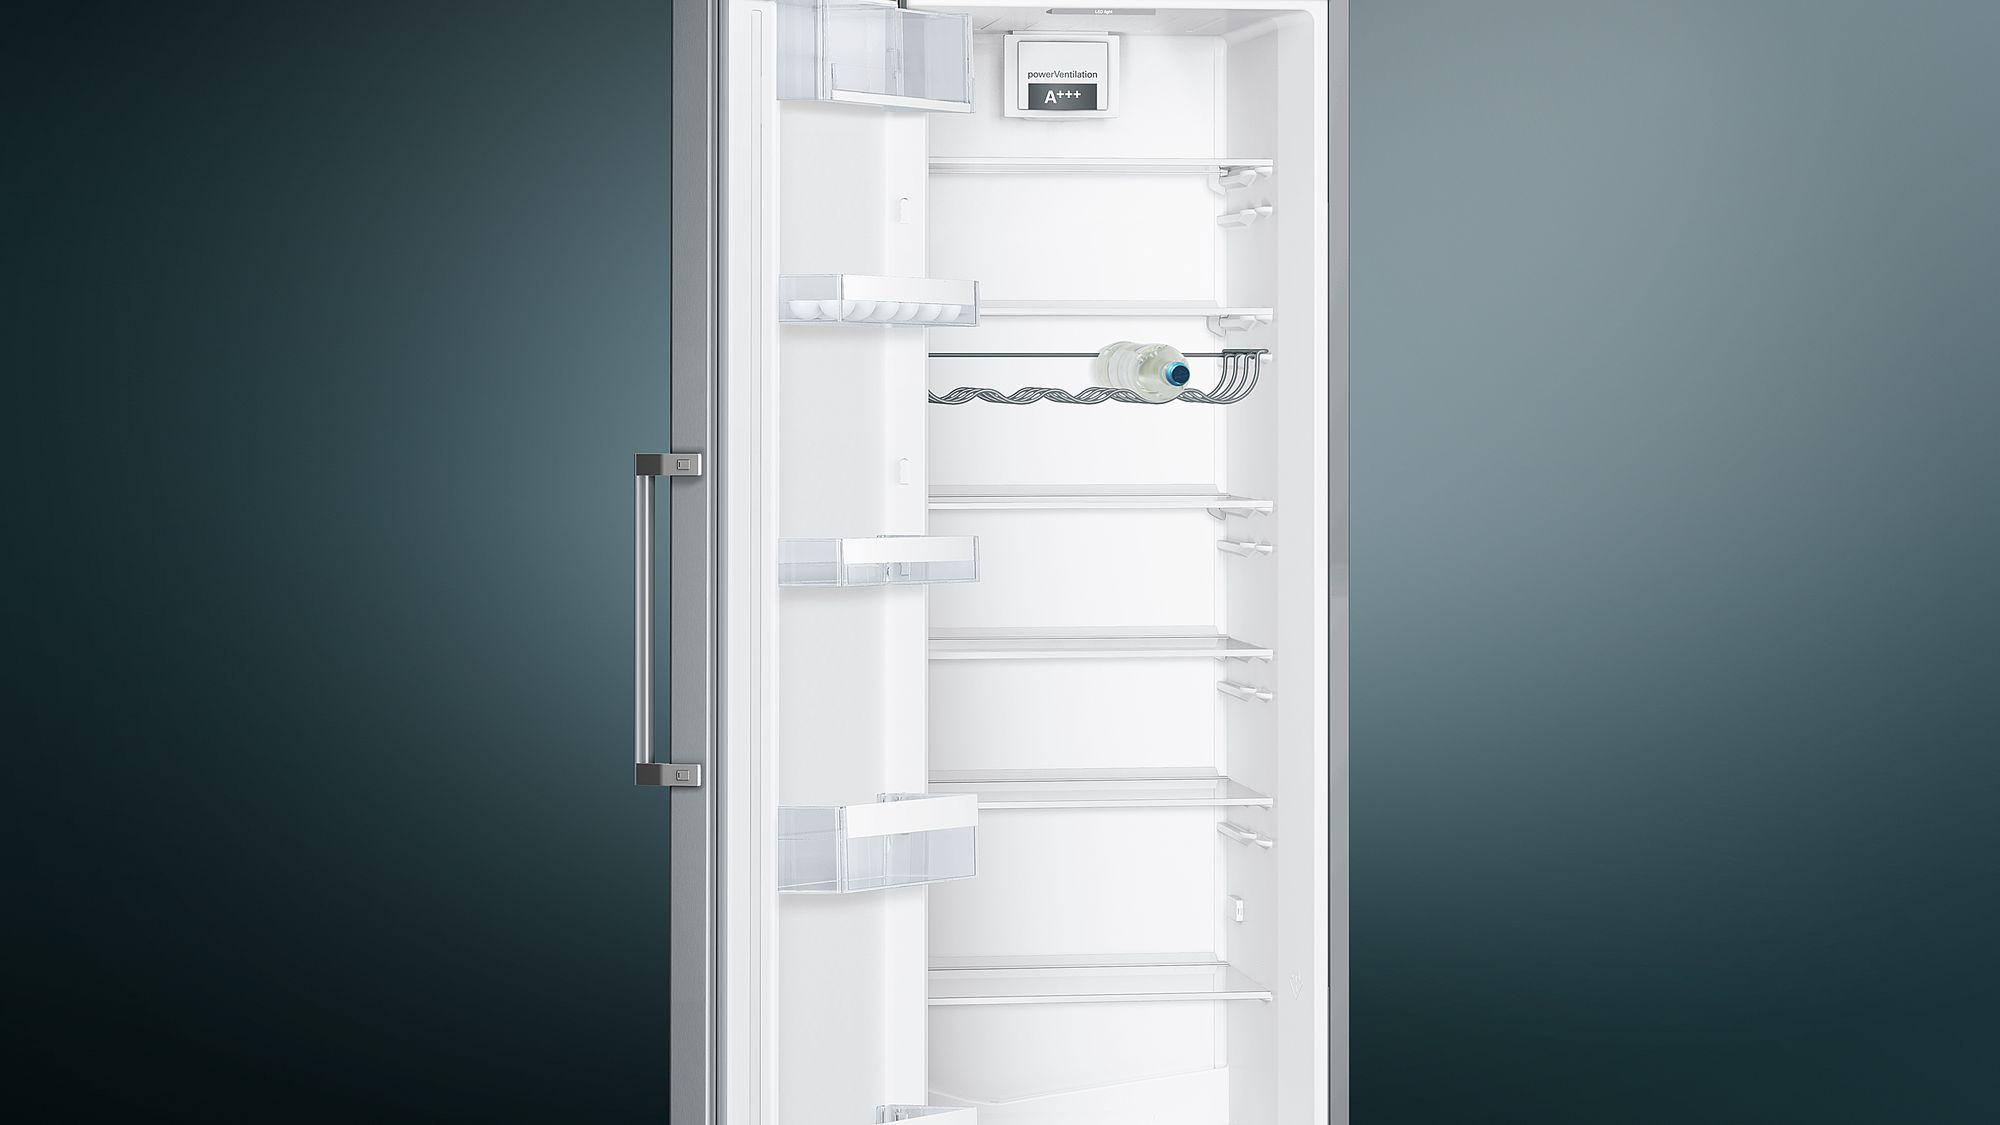 Siemens Kühlschrank Silber : Siemens stand kühlschrank iq türen edelstahl look ks vvl p